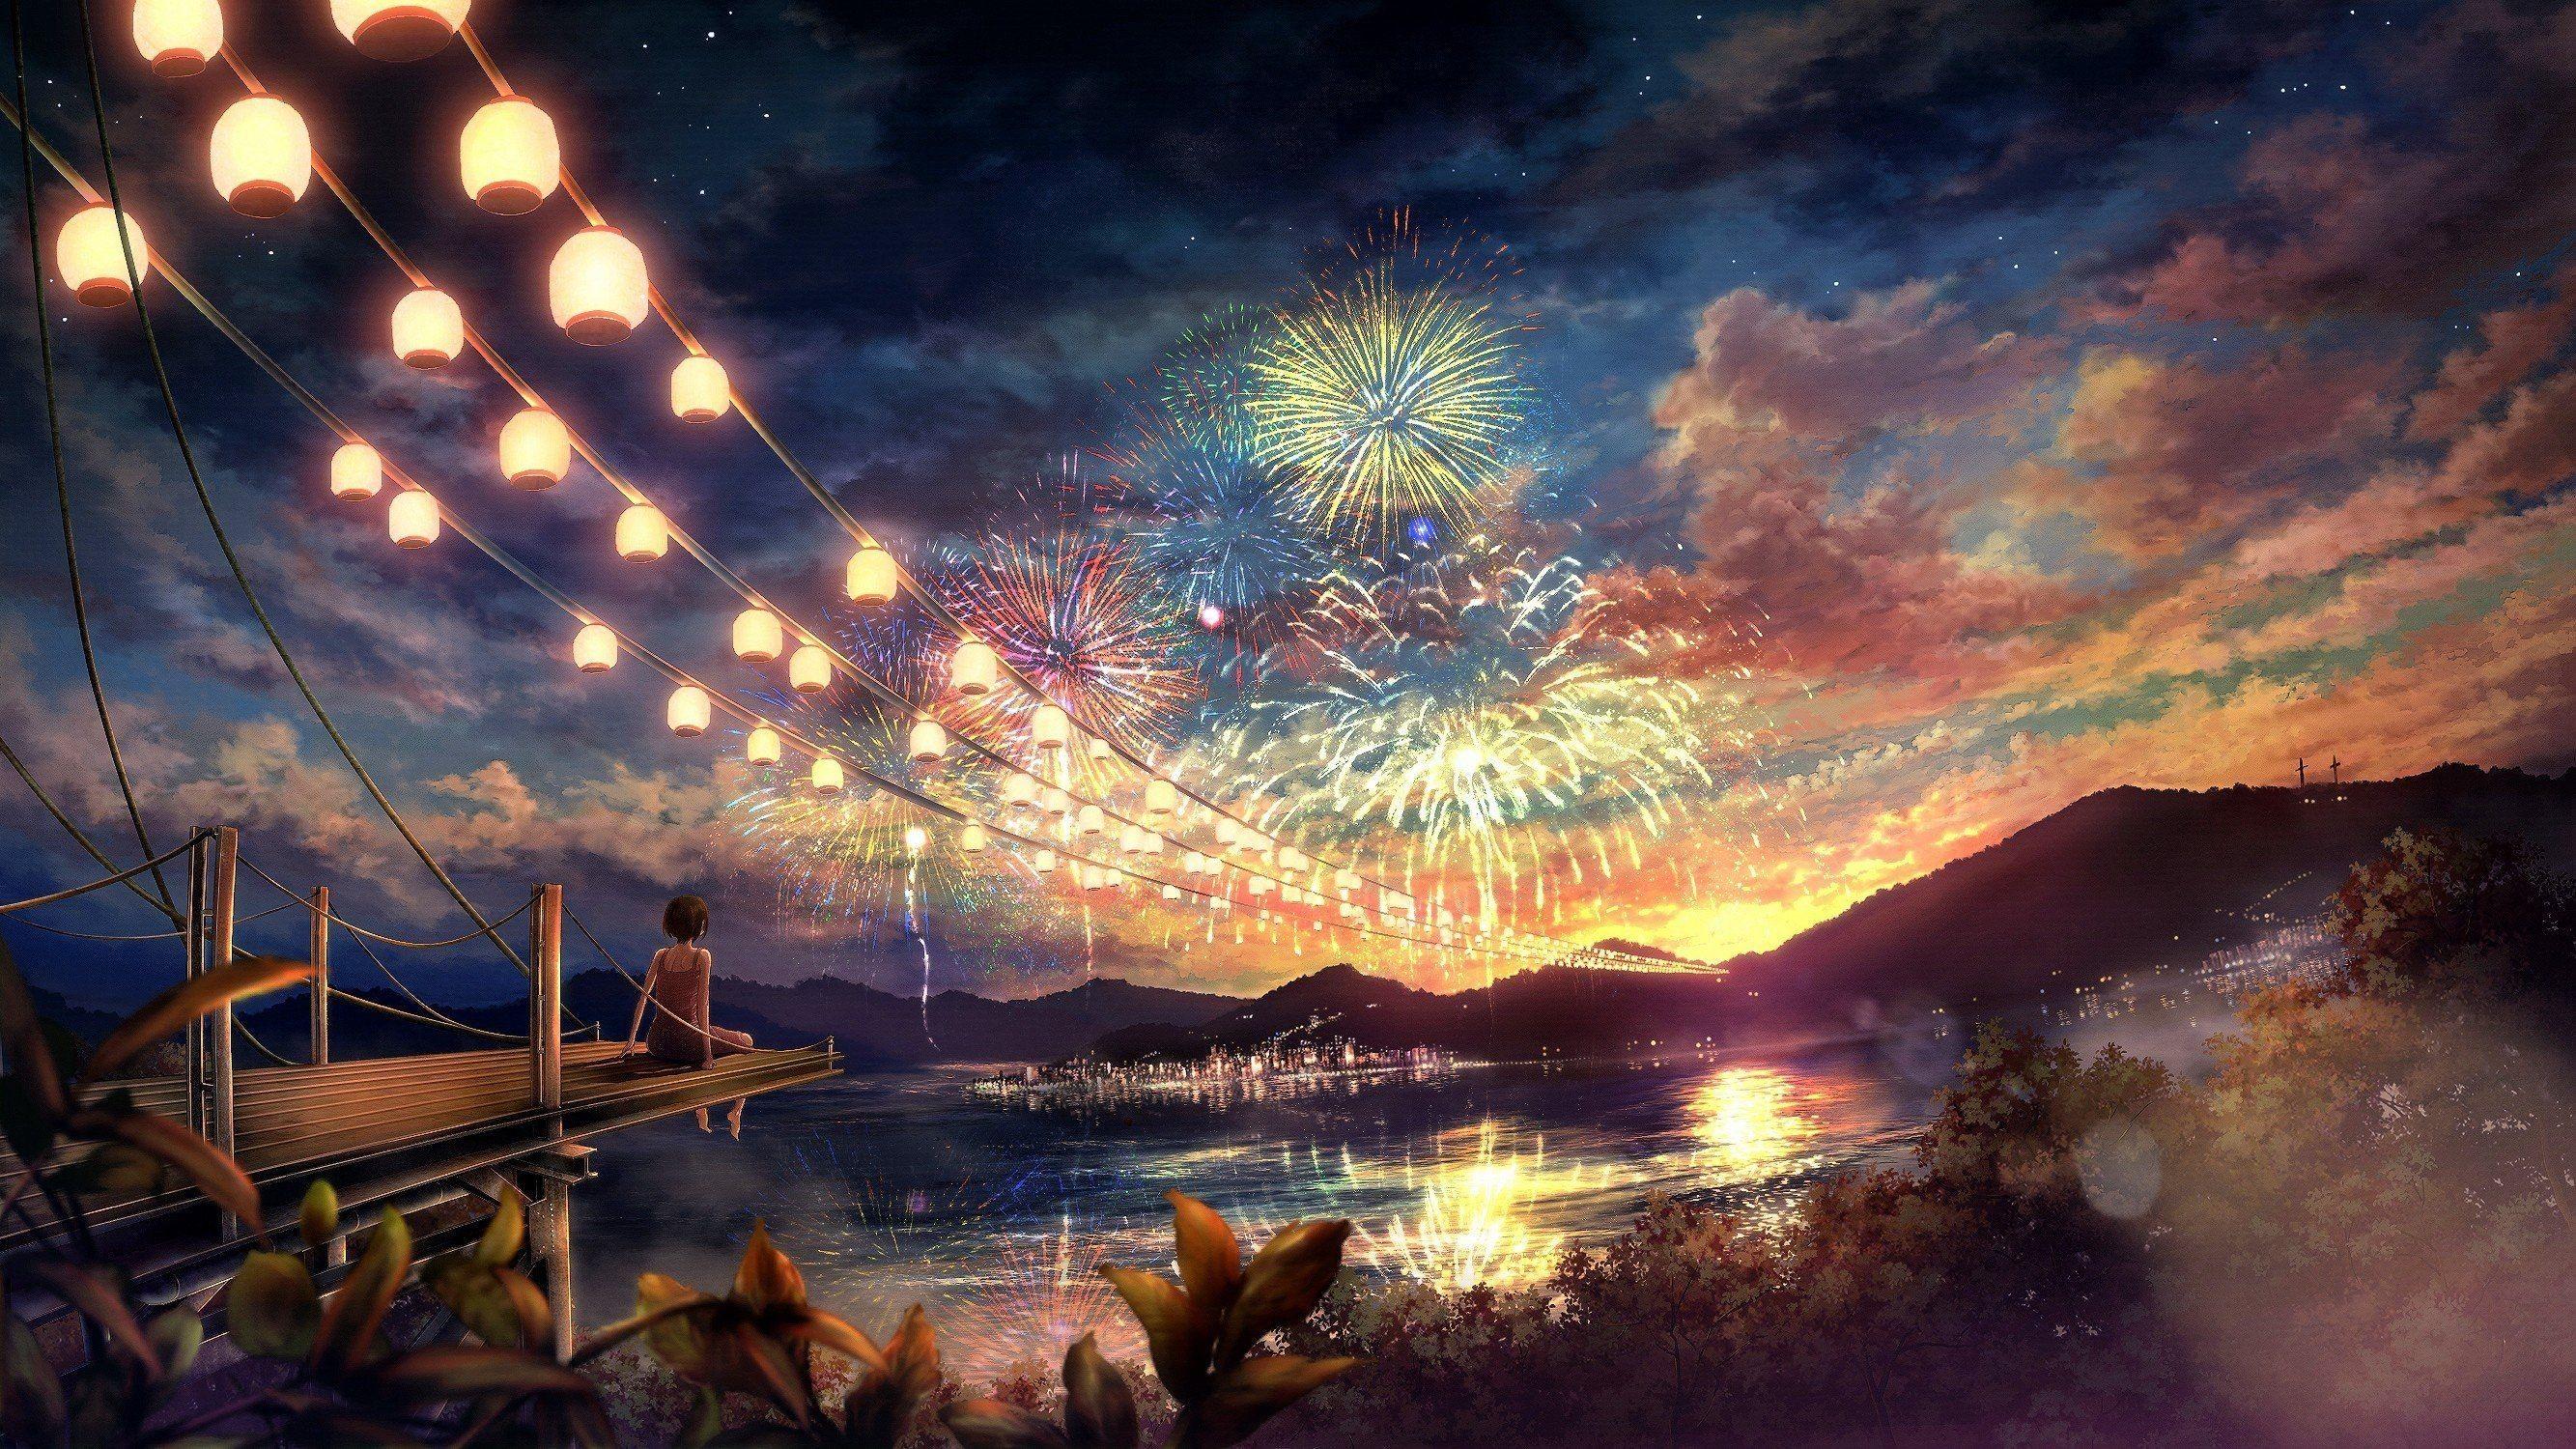 4k Wallpaper Anime Landscape Hd Art Wallpaper In 2020 Scenery Wallpaper Anime Scenery Landscape Wallpaper